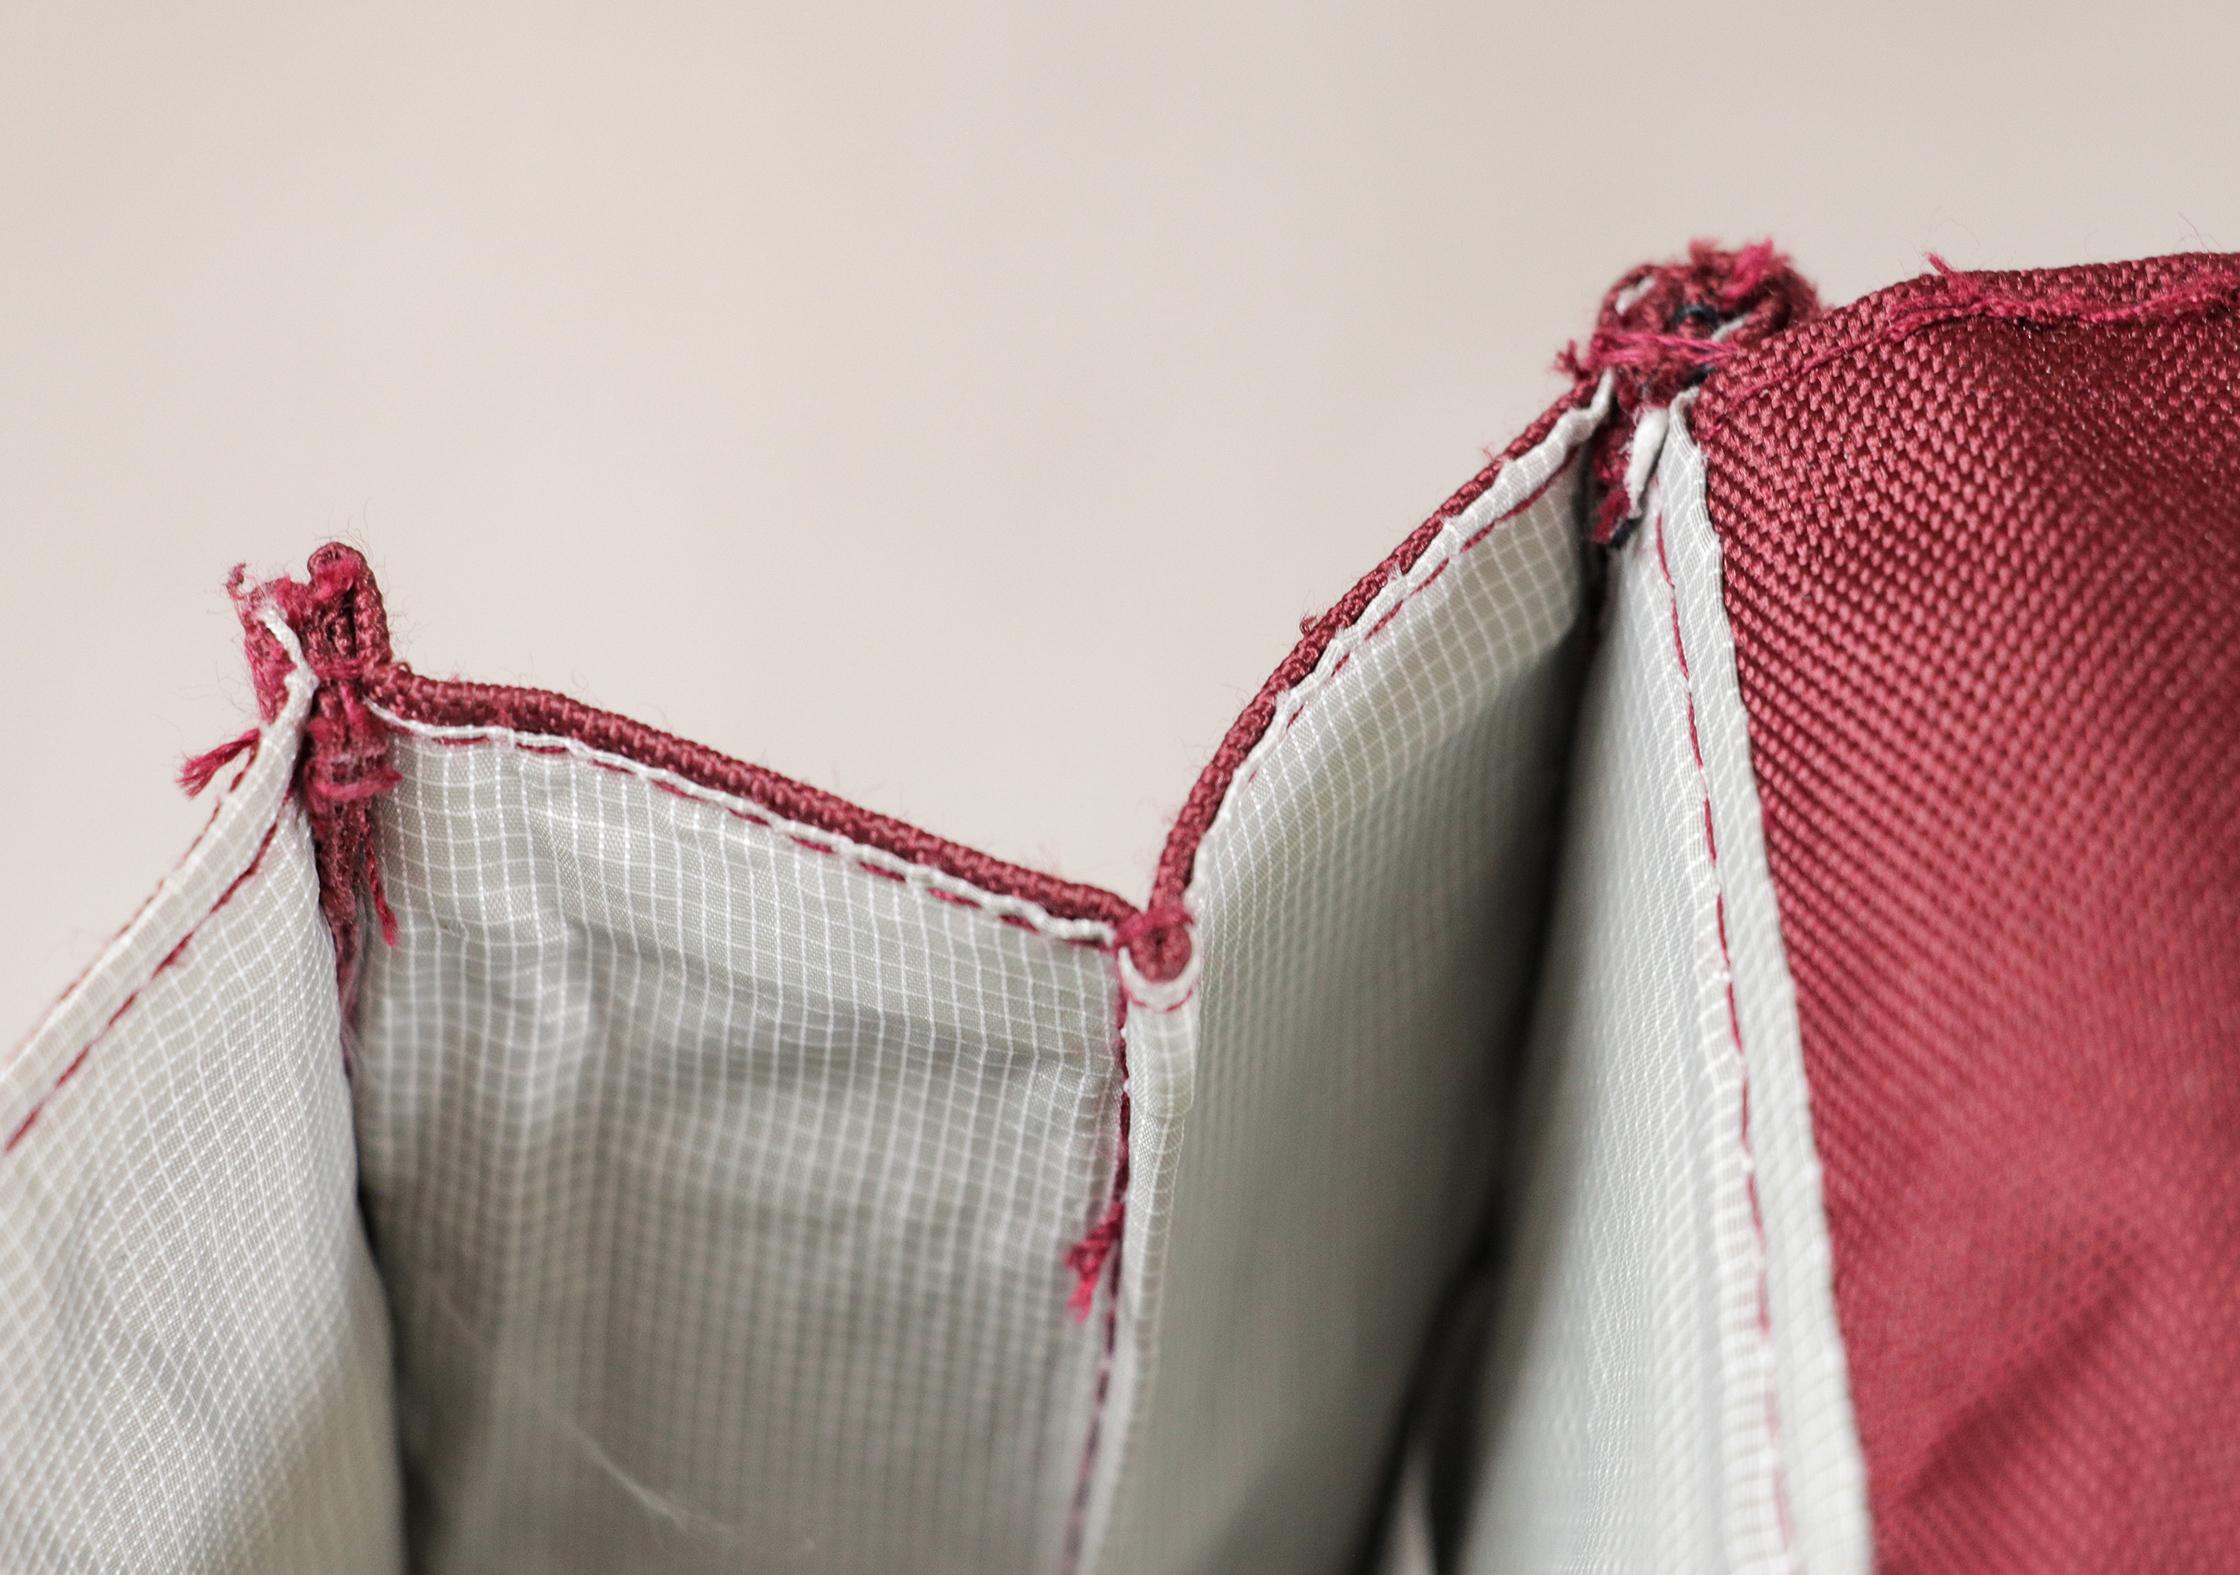 Lefrik Handy Backpack Stitching